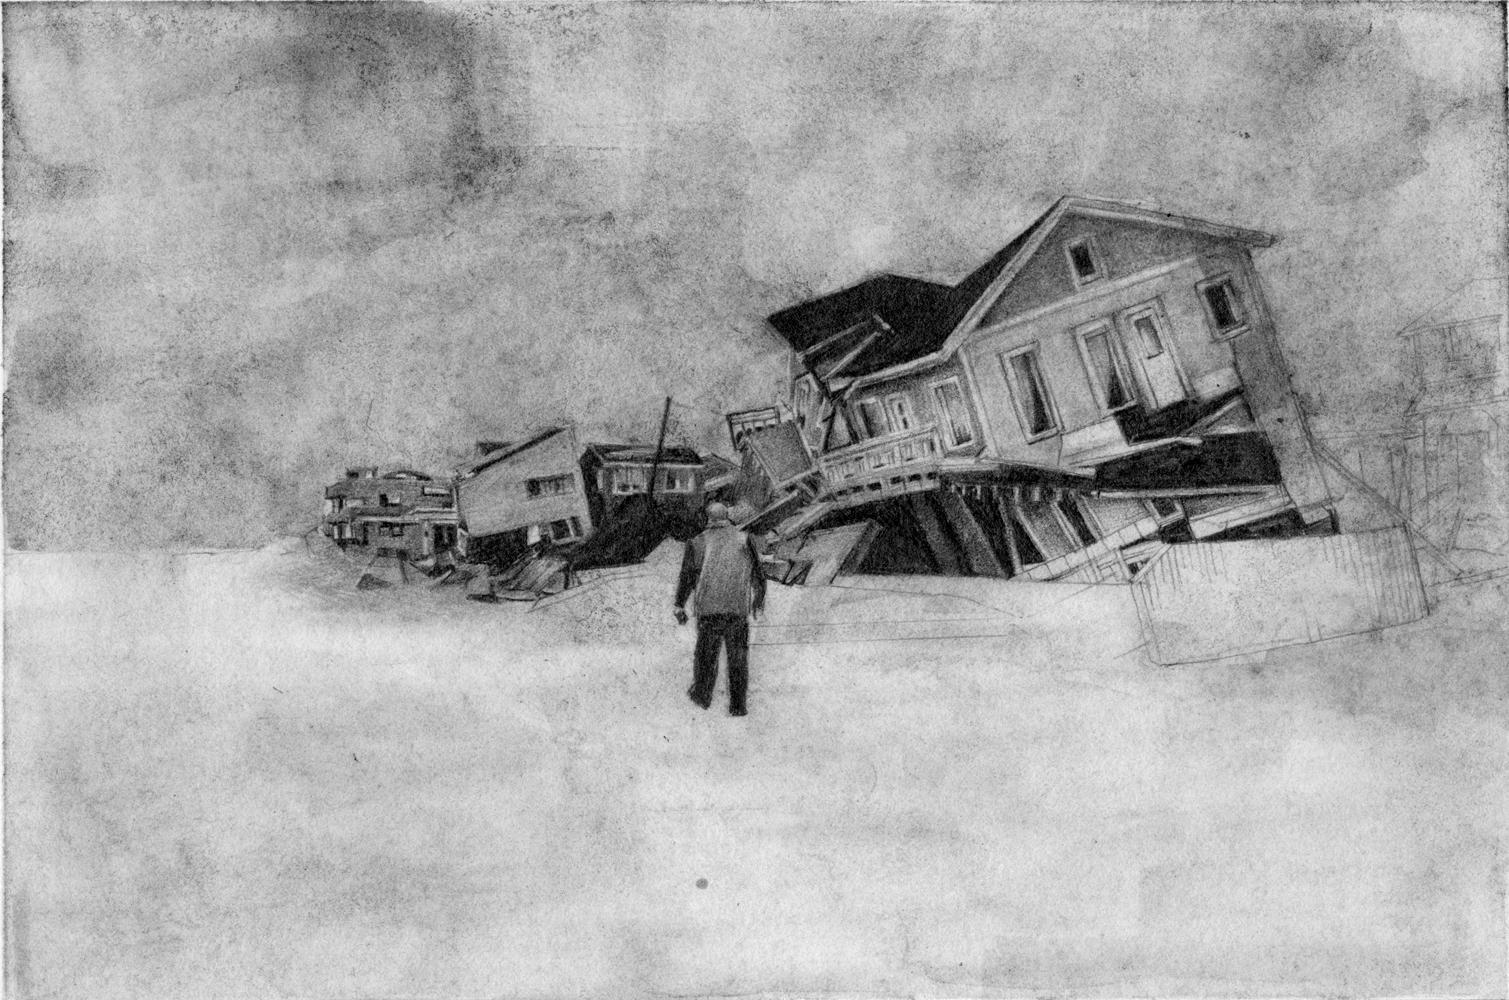 Samantha Scherer, Tilted, 2018, graphite on paper, 10 x 10 inches, framed, $950.